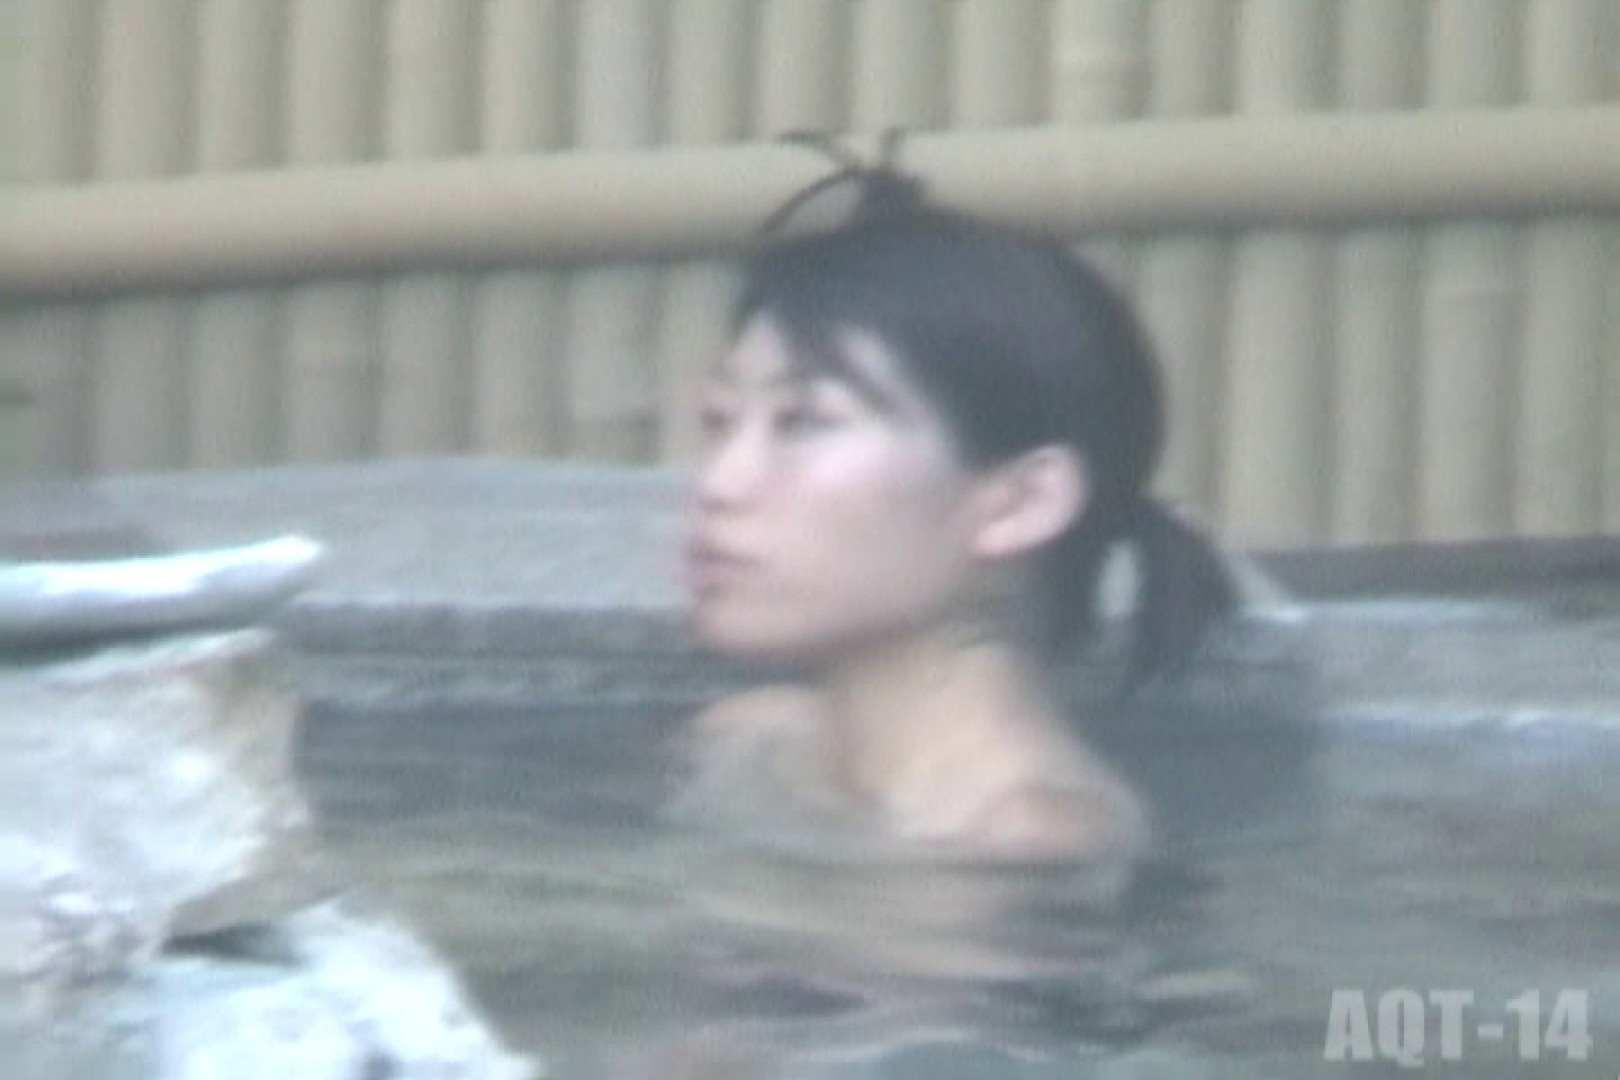 Aquaな露天風呂Vol.820 盗撮師作品  104pic 93